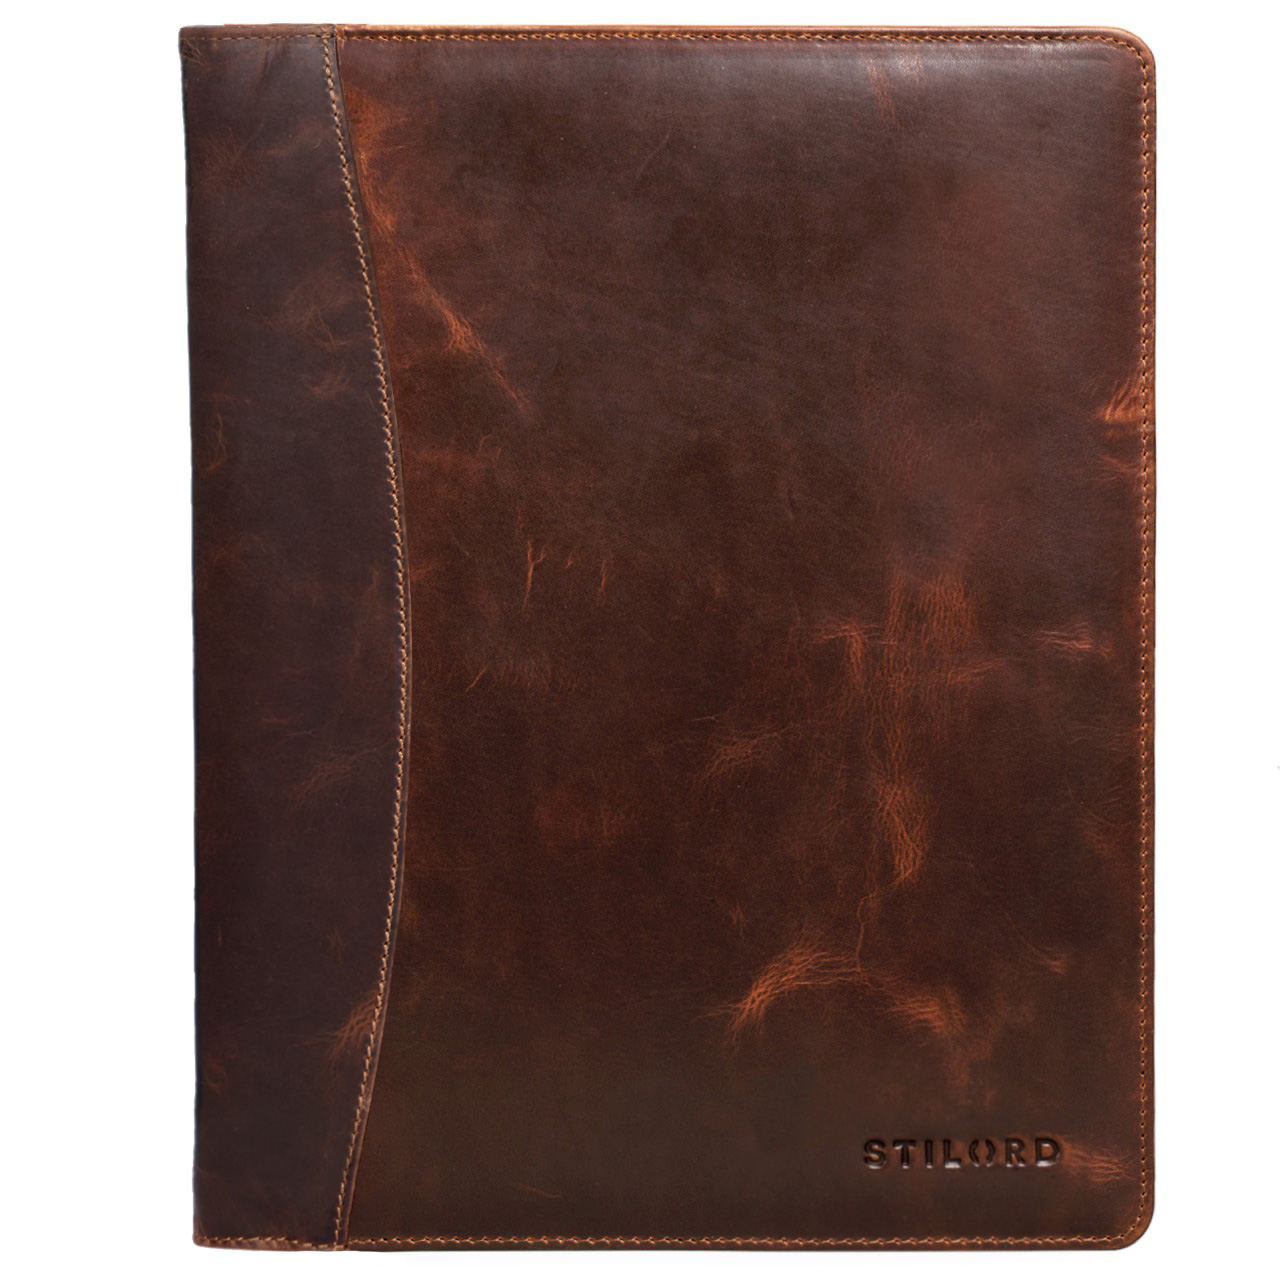 STILORD Vintage Konferenzmappe DIN A4 Ringbuch Schreibmappe Leder dunkelbraun